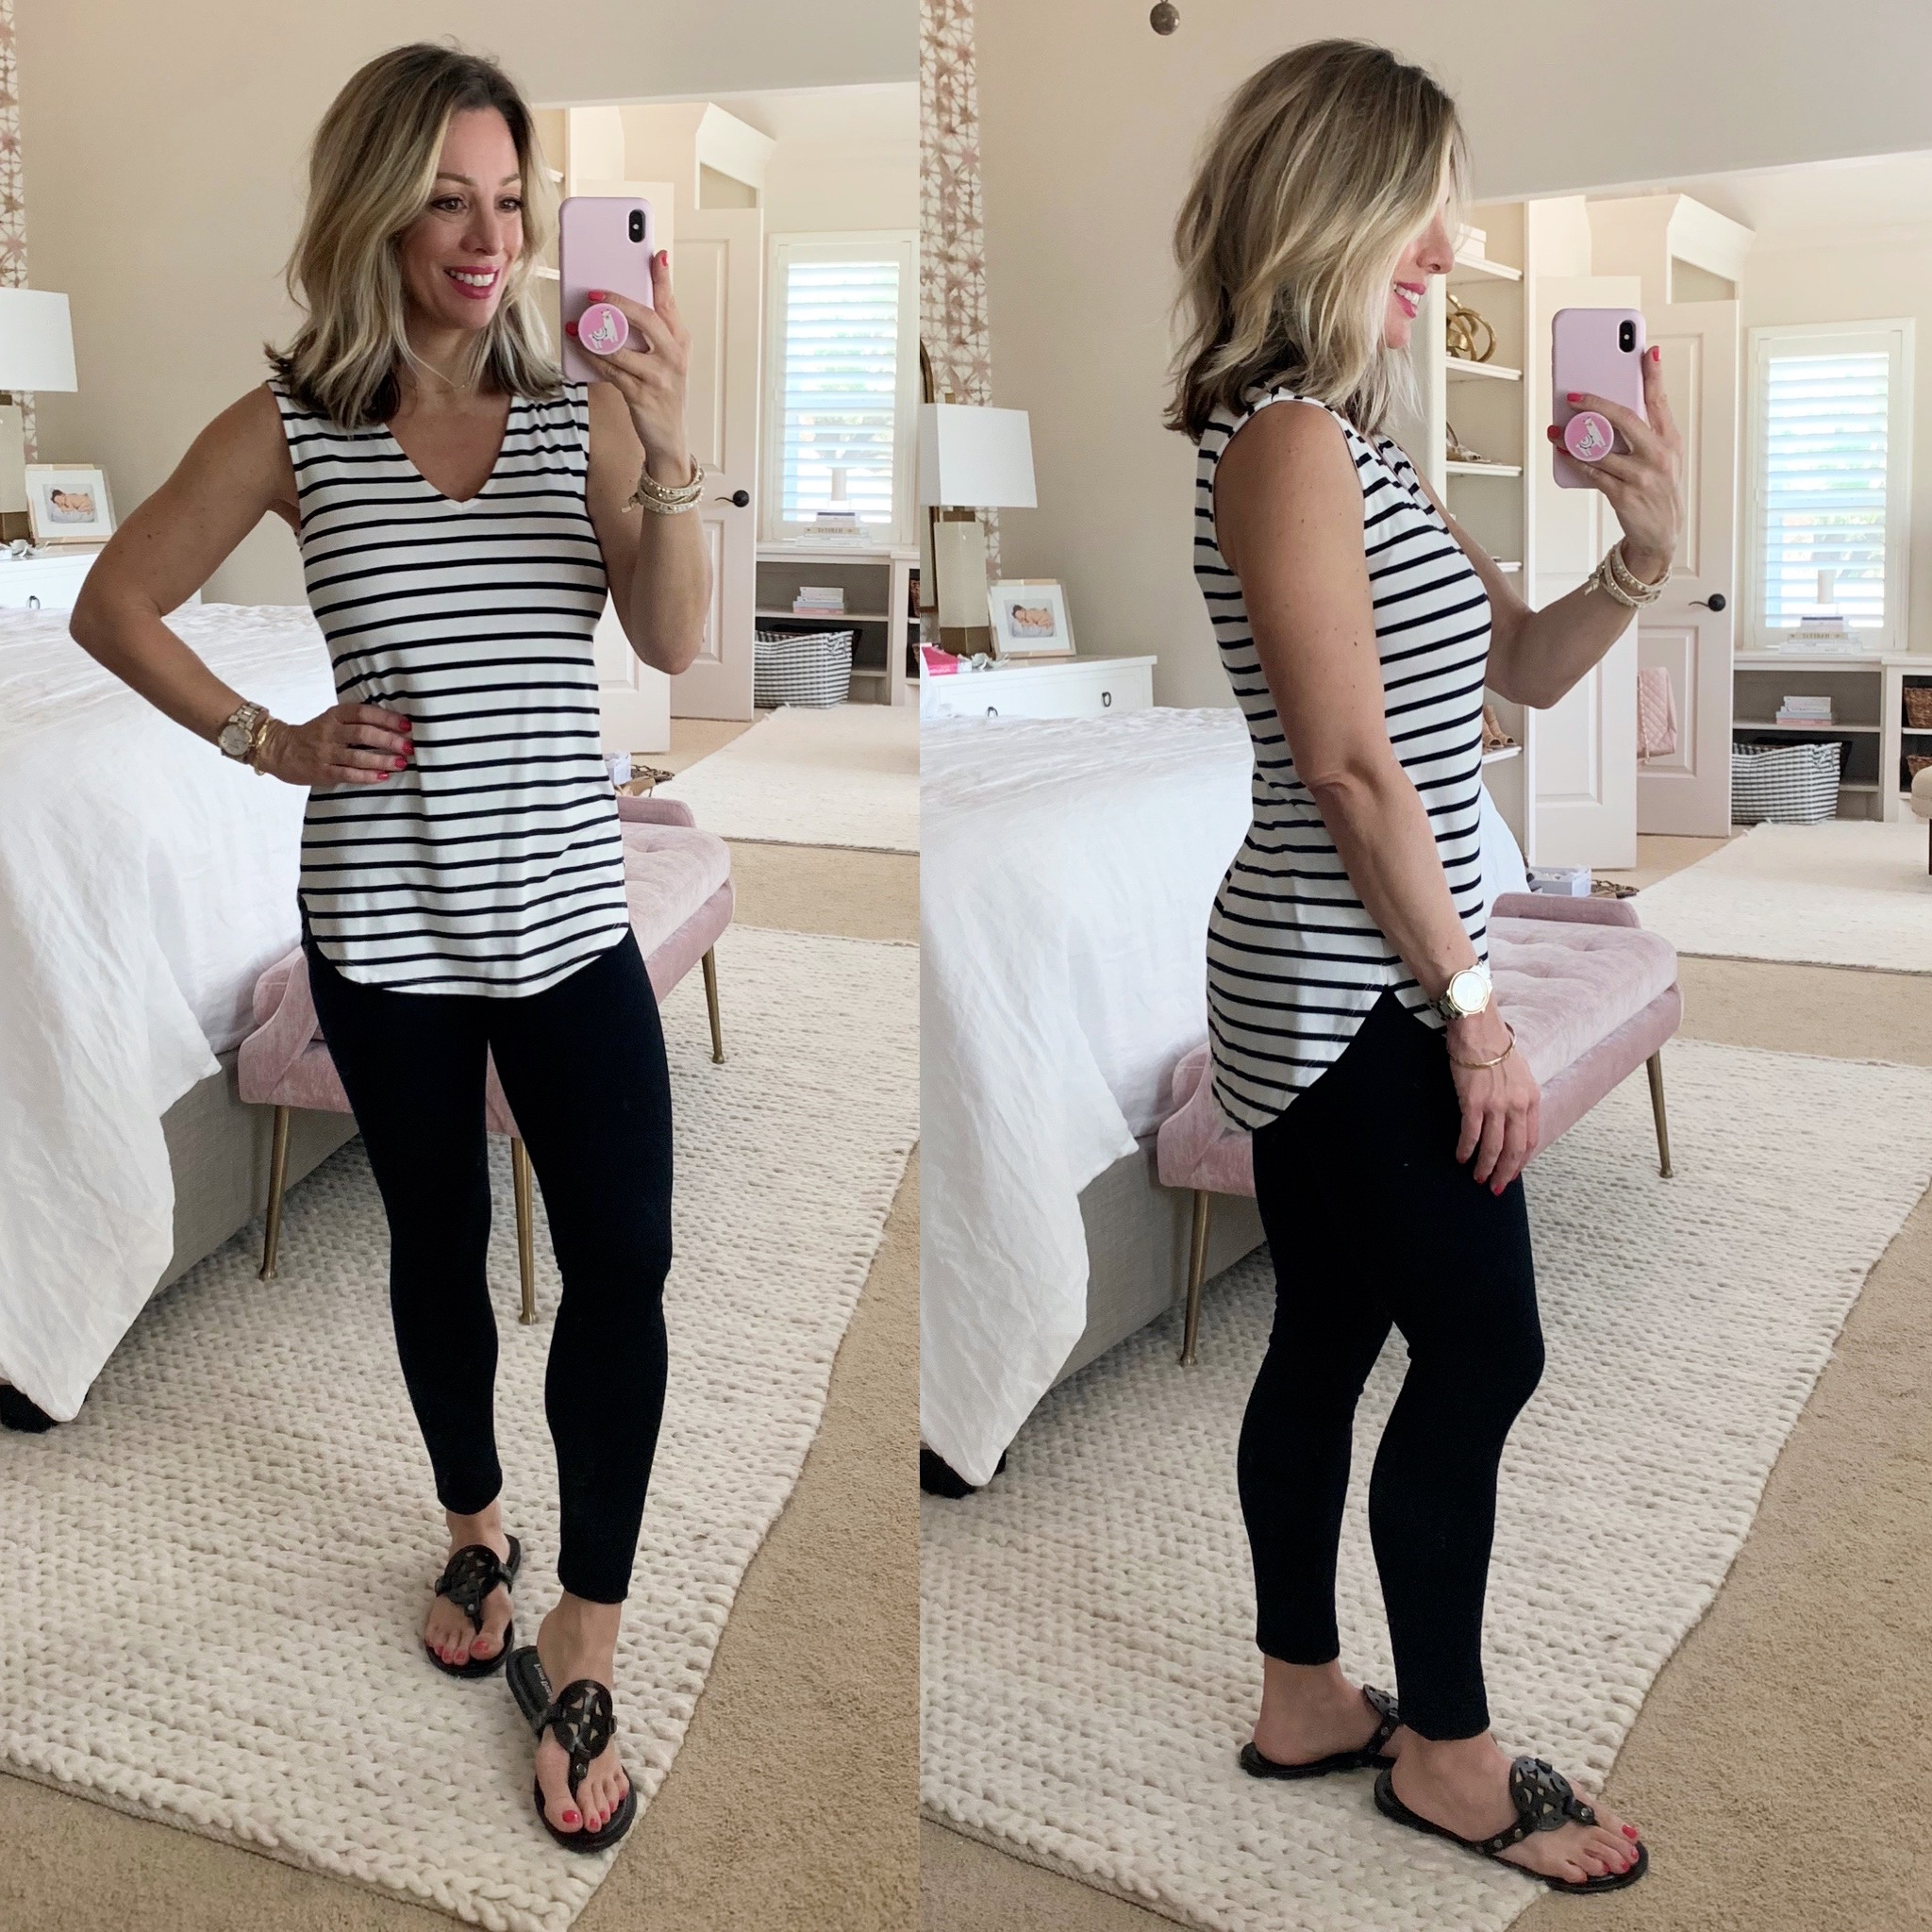 Stripe Tank, Daily Ritual Leggings, Miller Dupe Sandals